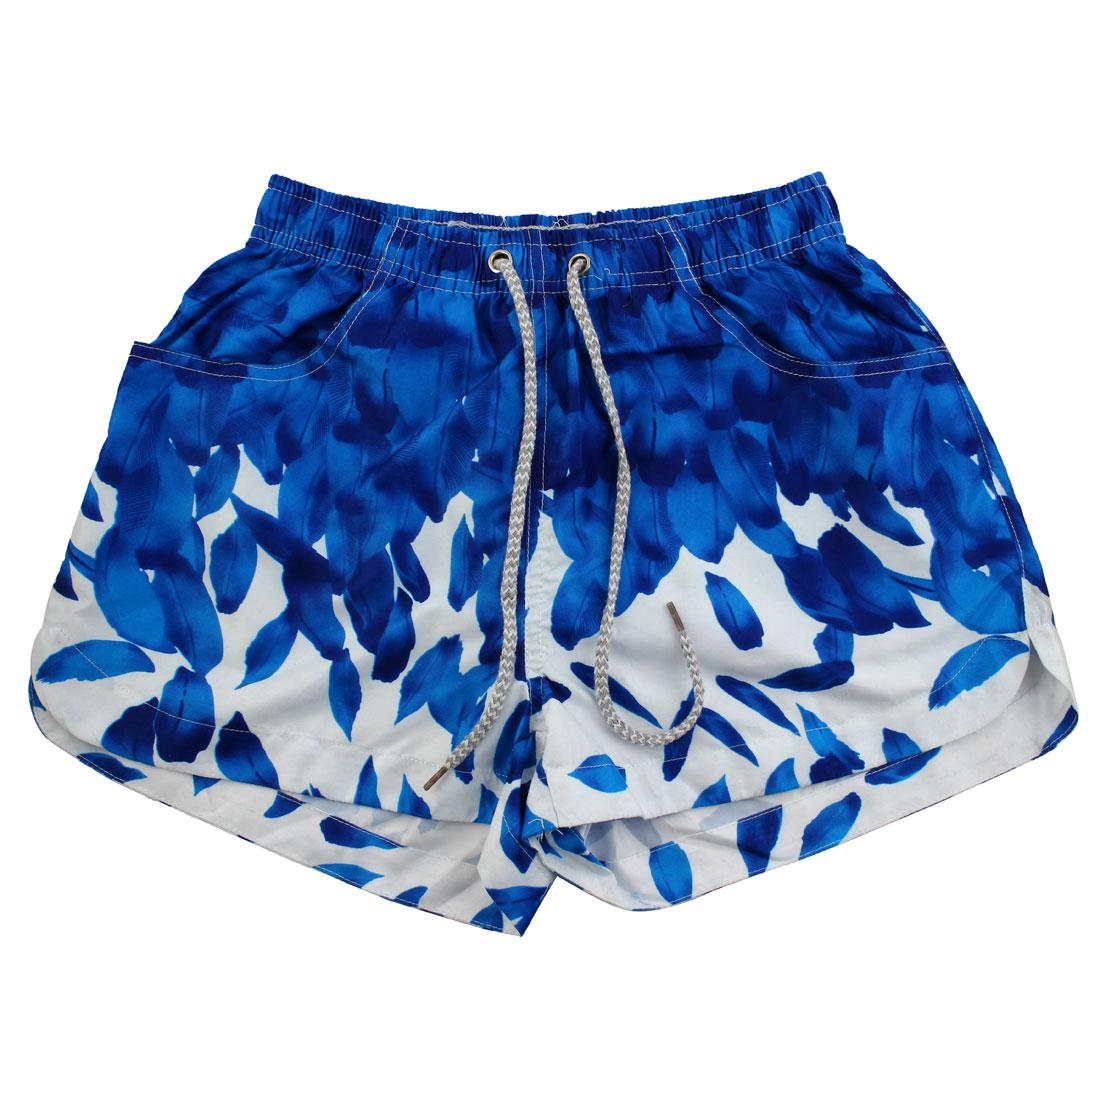 Women Lady Polyester Sea Beach Shorts Breathable Half Pants Adjustable Swim Trunks W25